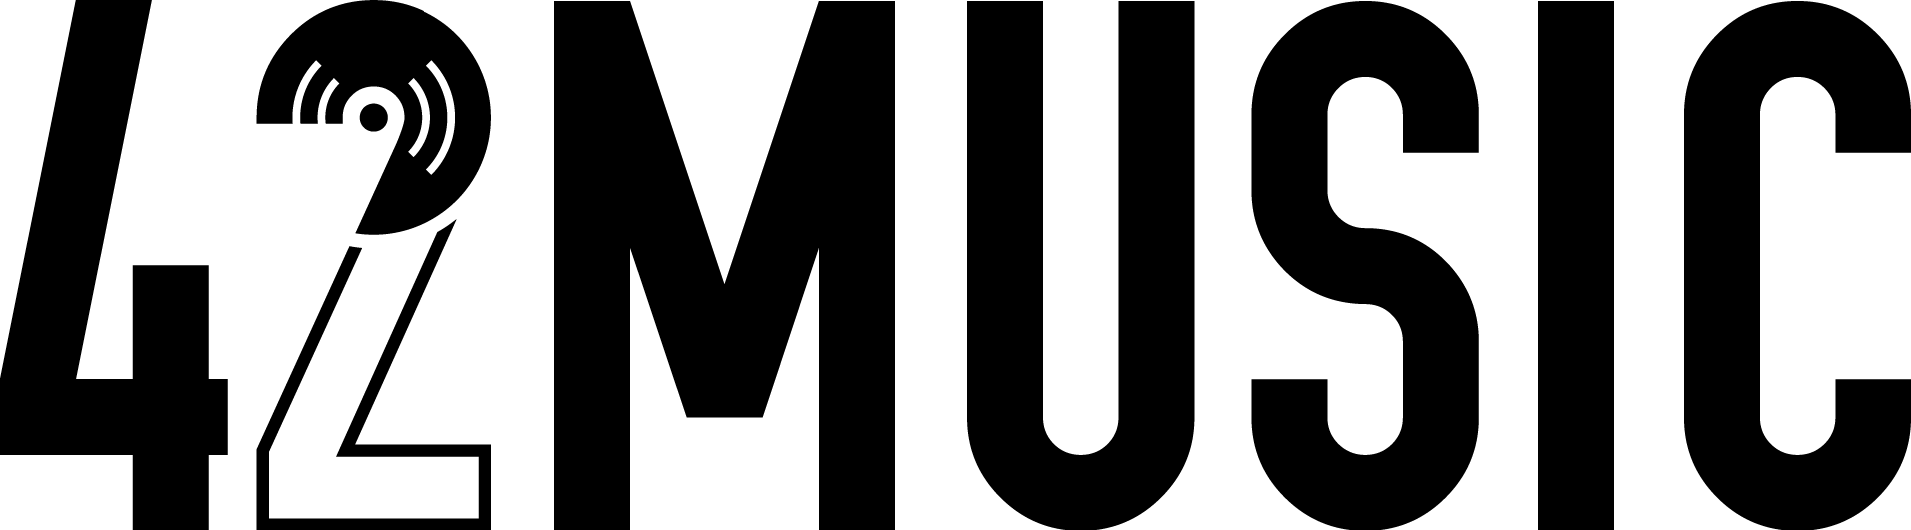 42MUSIC